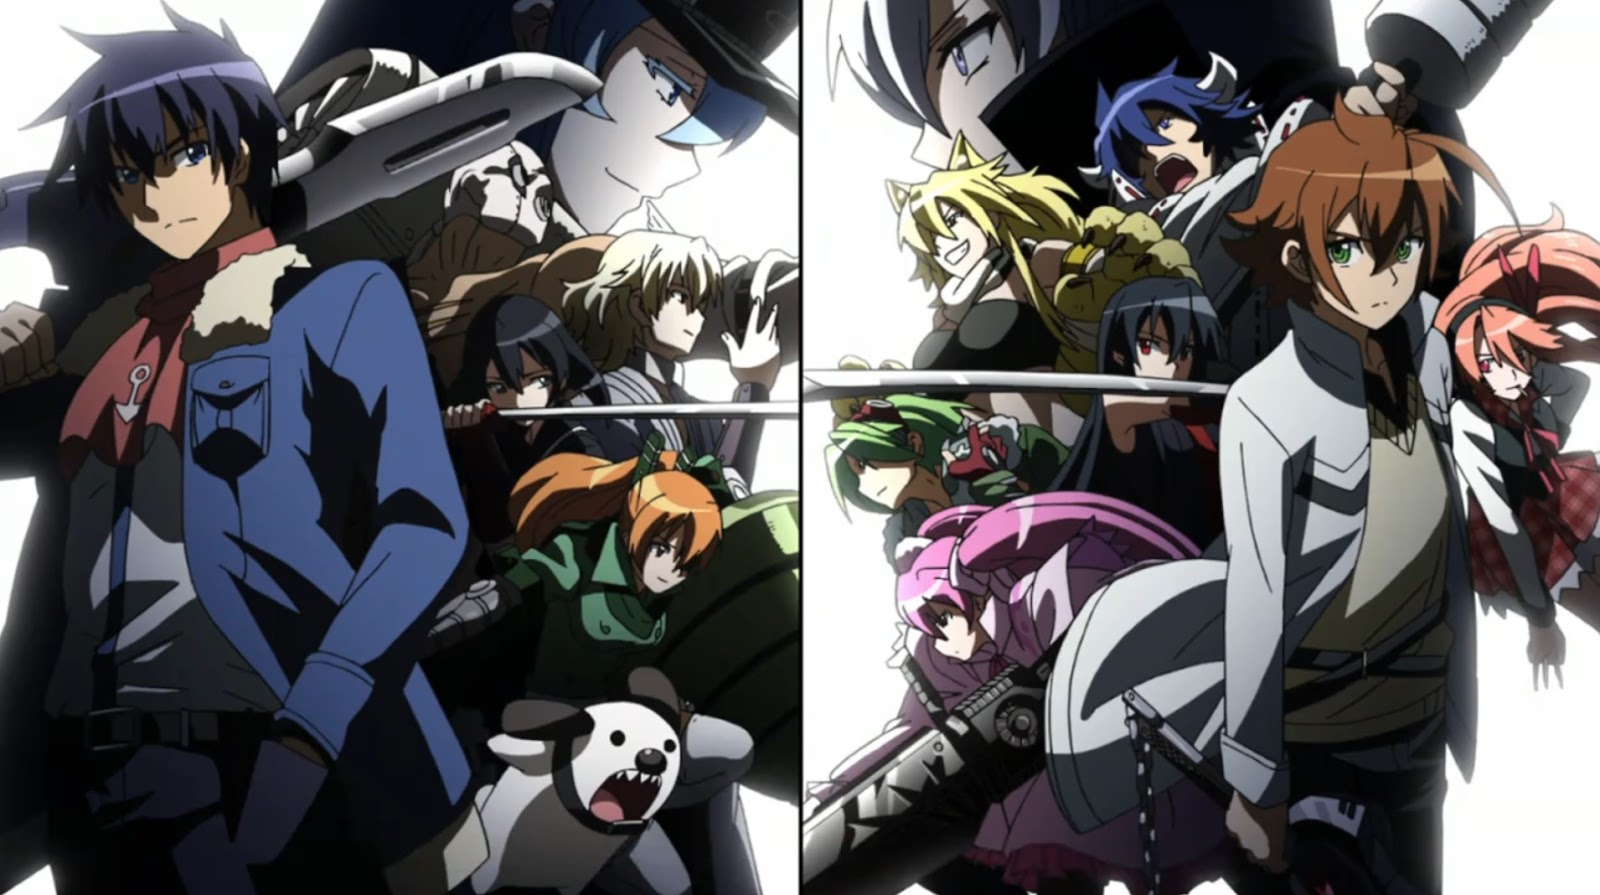 Assistir Akame ga Kill Episódio 15 HD, Akame ga Kill Episódio 15, Akame ga Kill! Episódio 15, Legendado Online, Akame ga Kill Episódio 15 Todos os Episódios